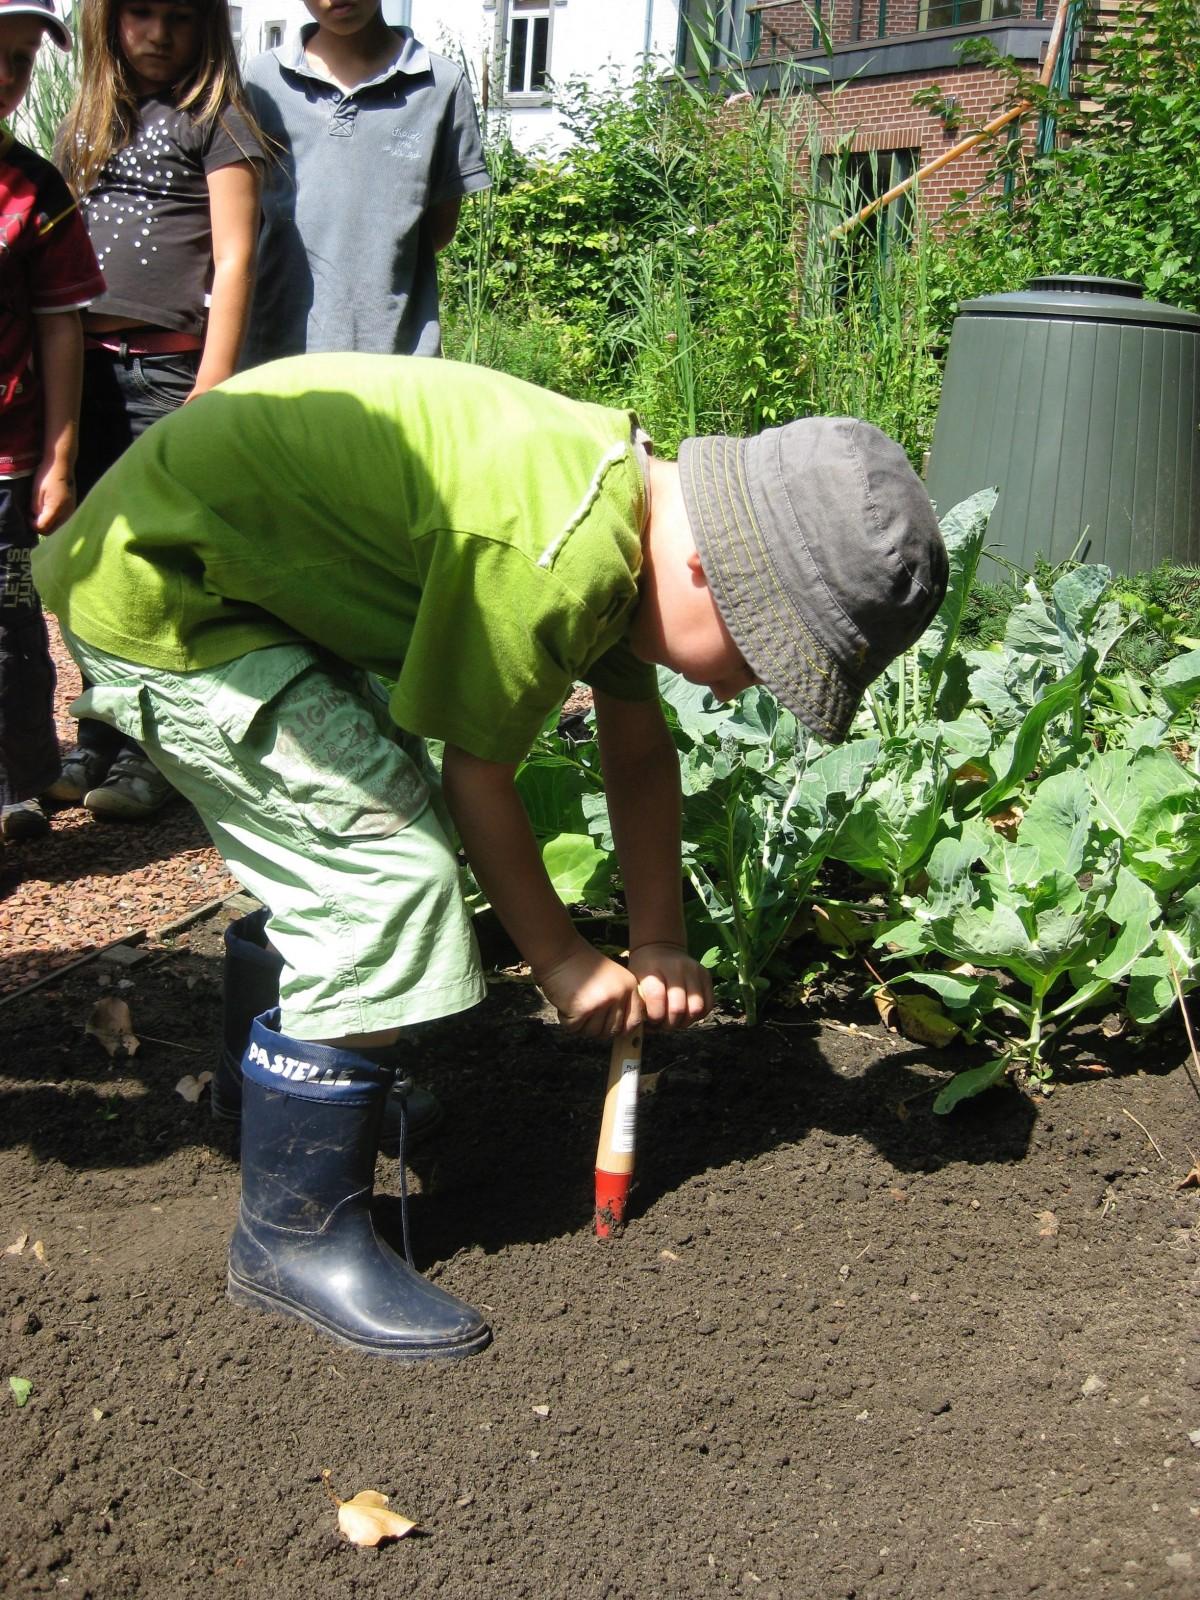 nature lawn asphalt green backyard soil garden children gardening plantation yard gardener